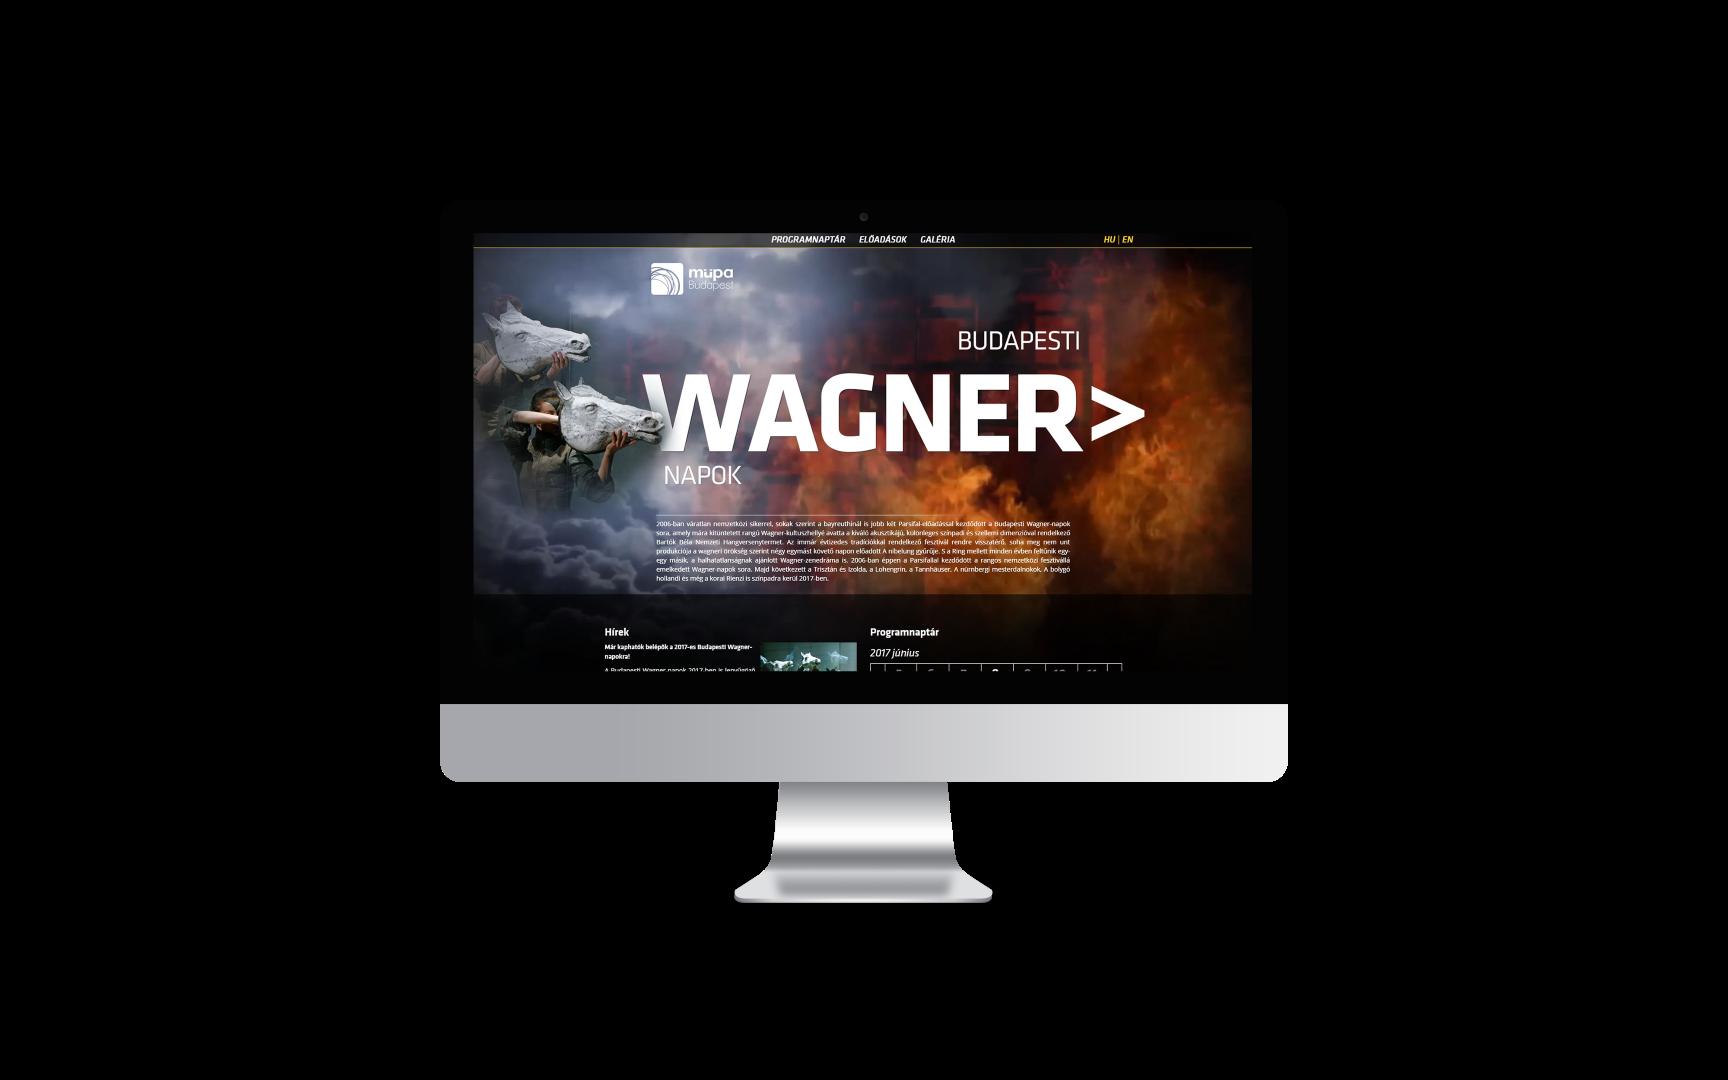 Budapesti Wagner Napok